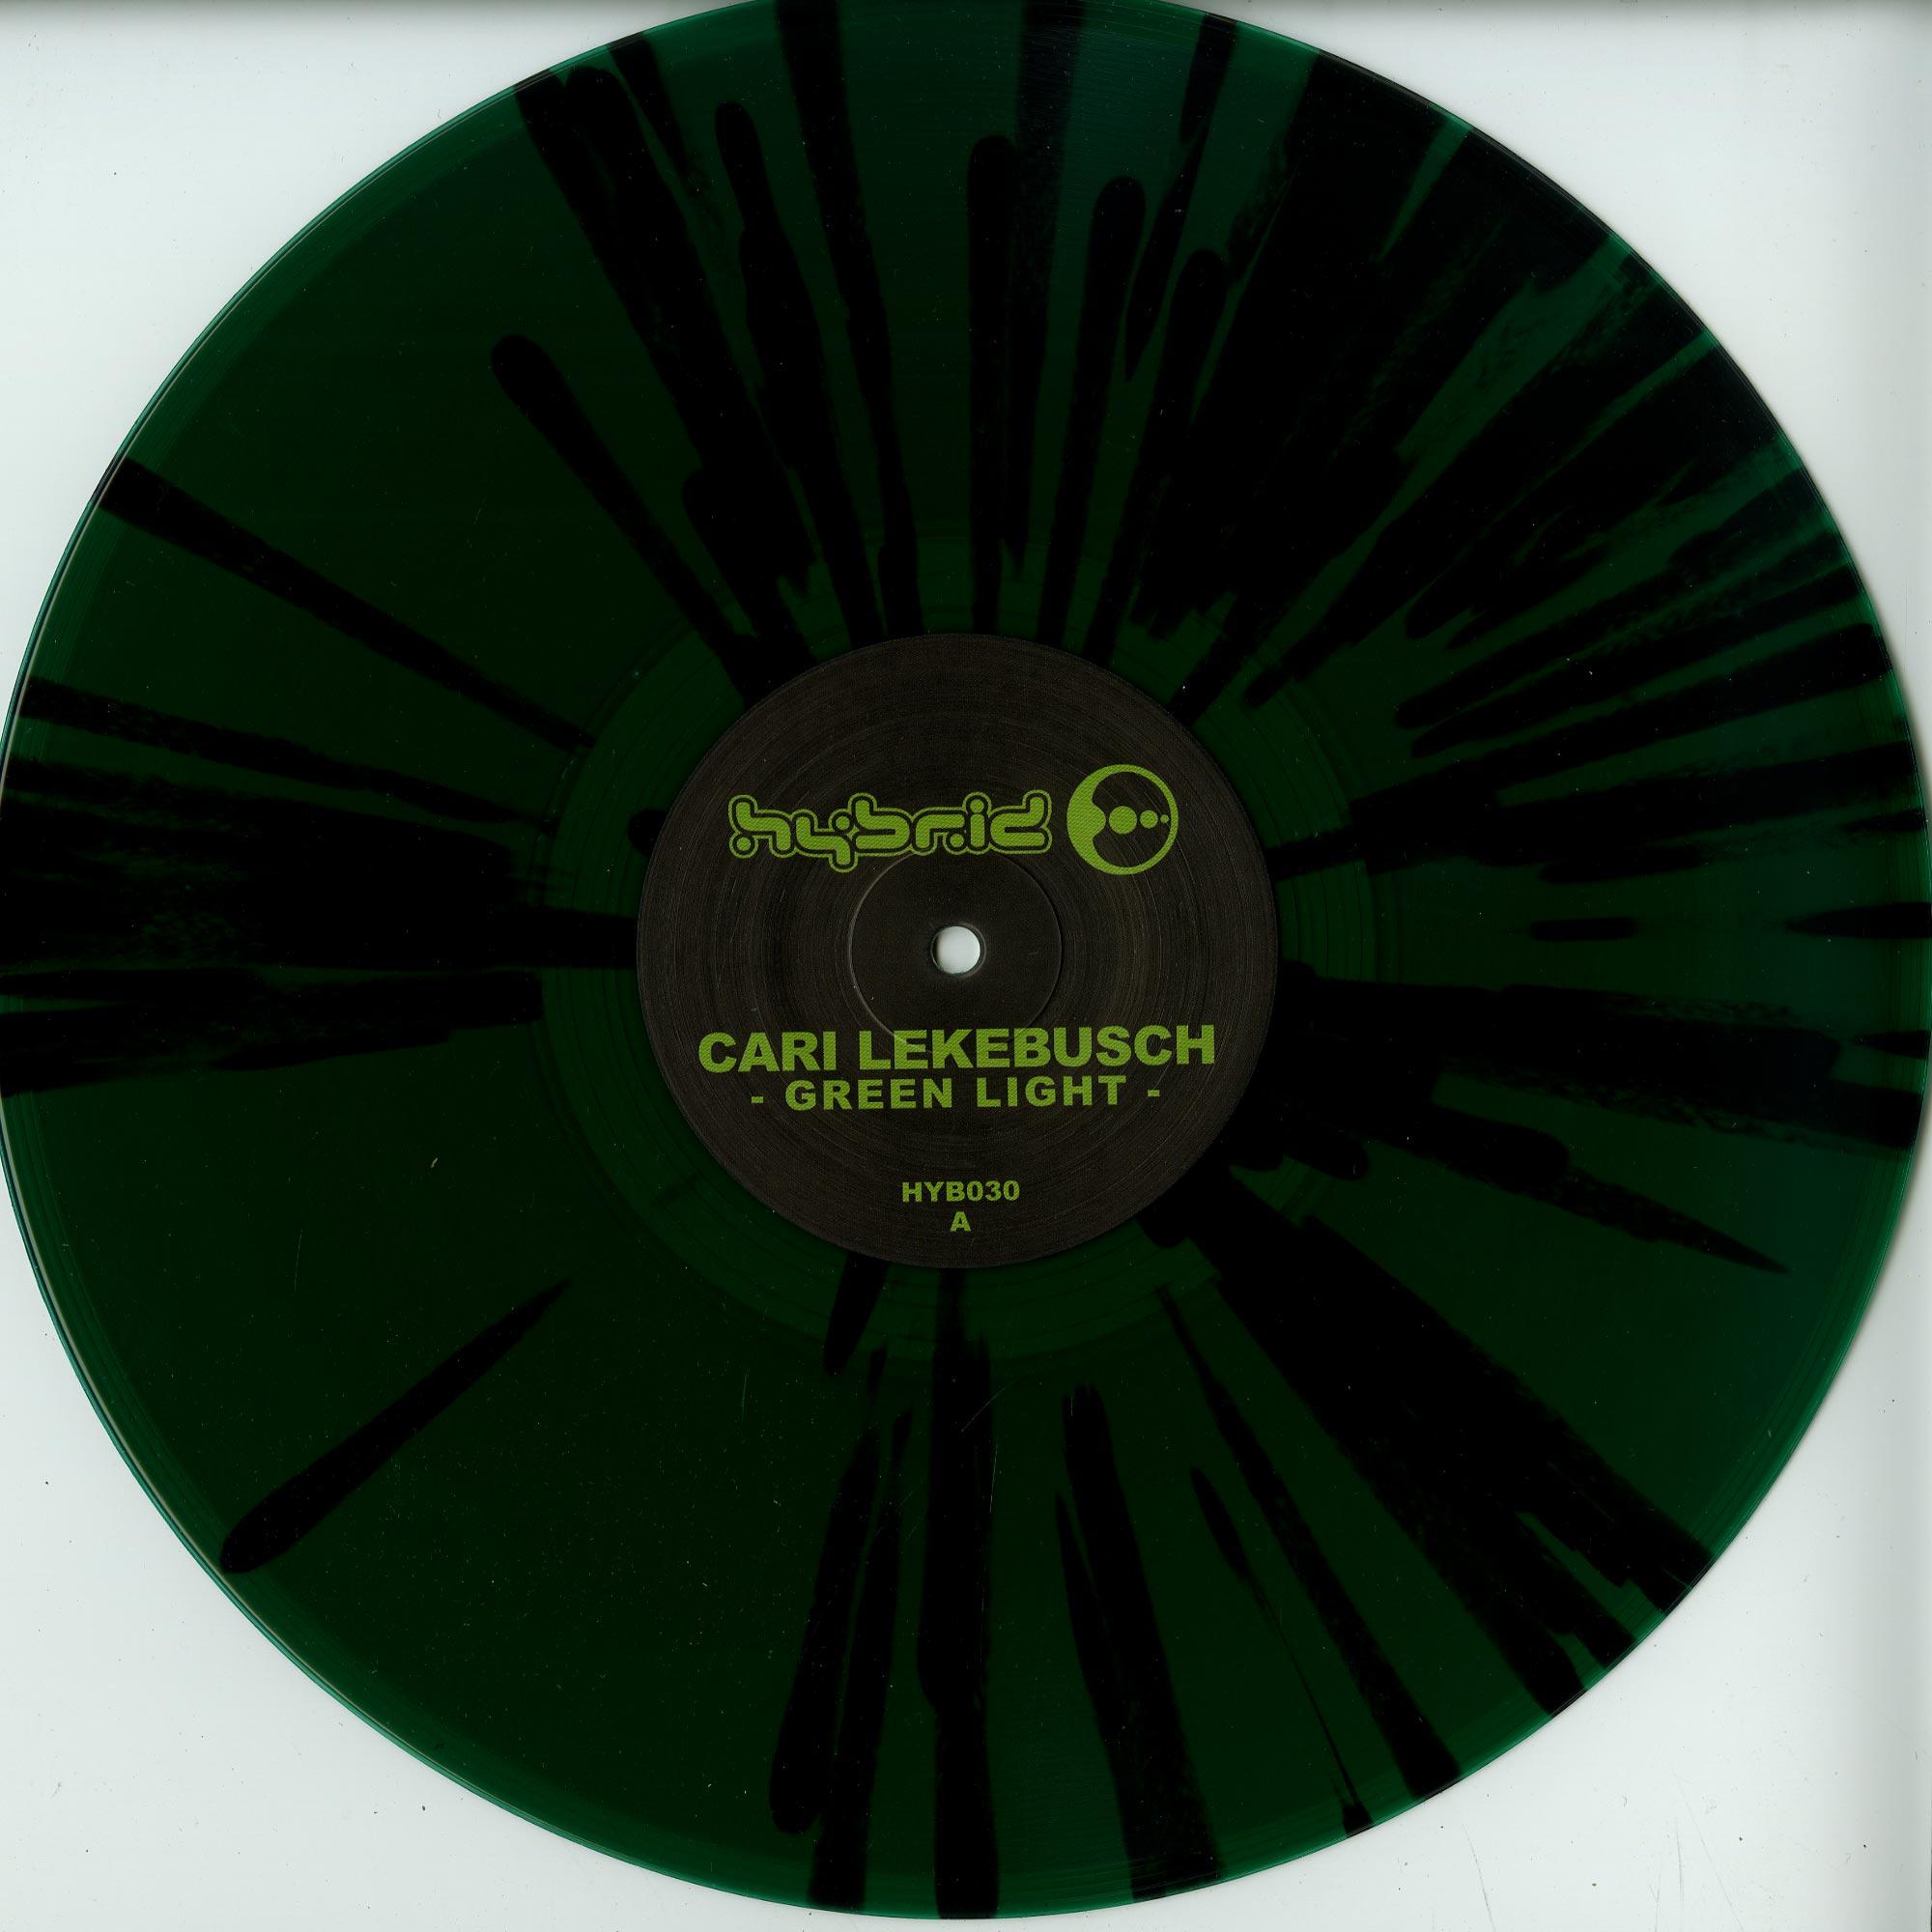 Cari Lekebusch - GREEN LIGHT